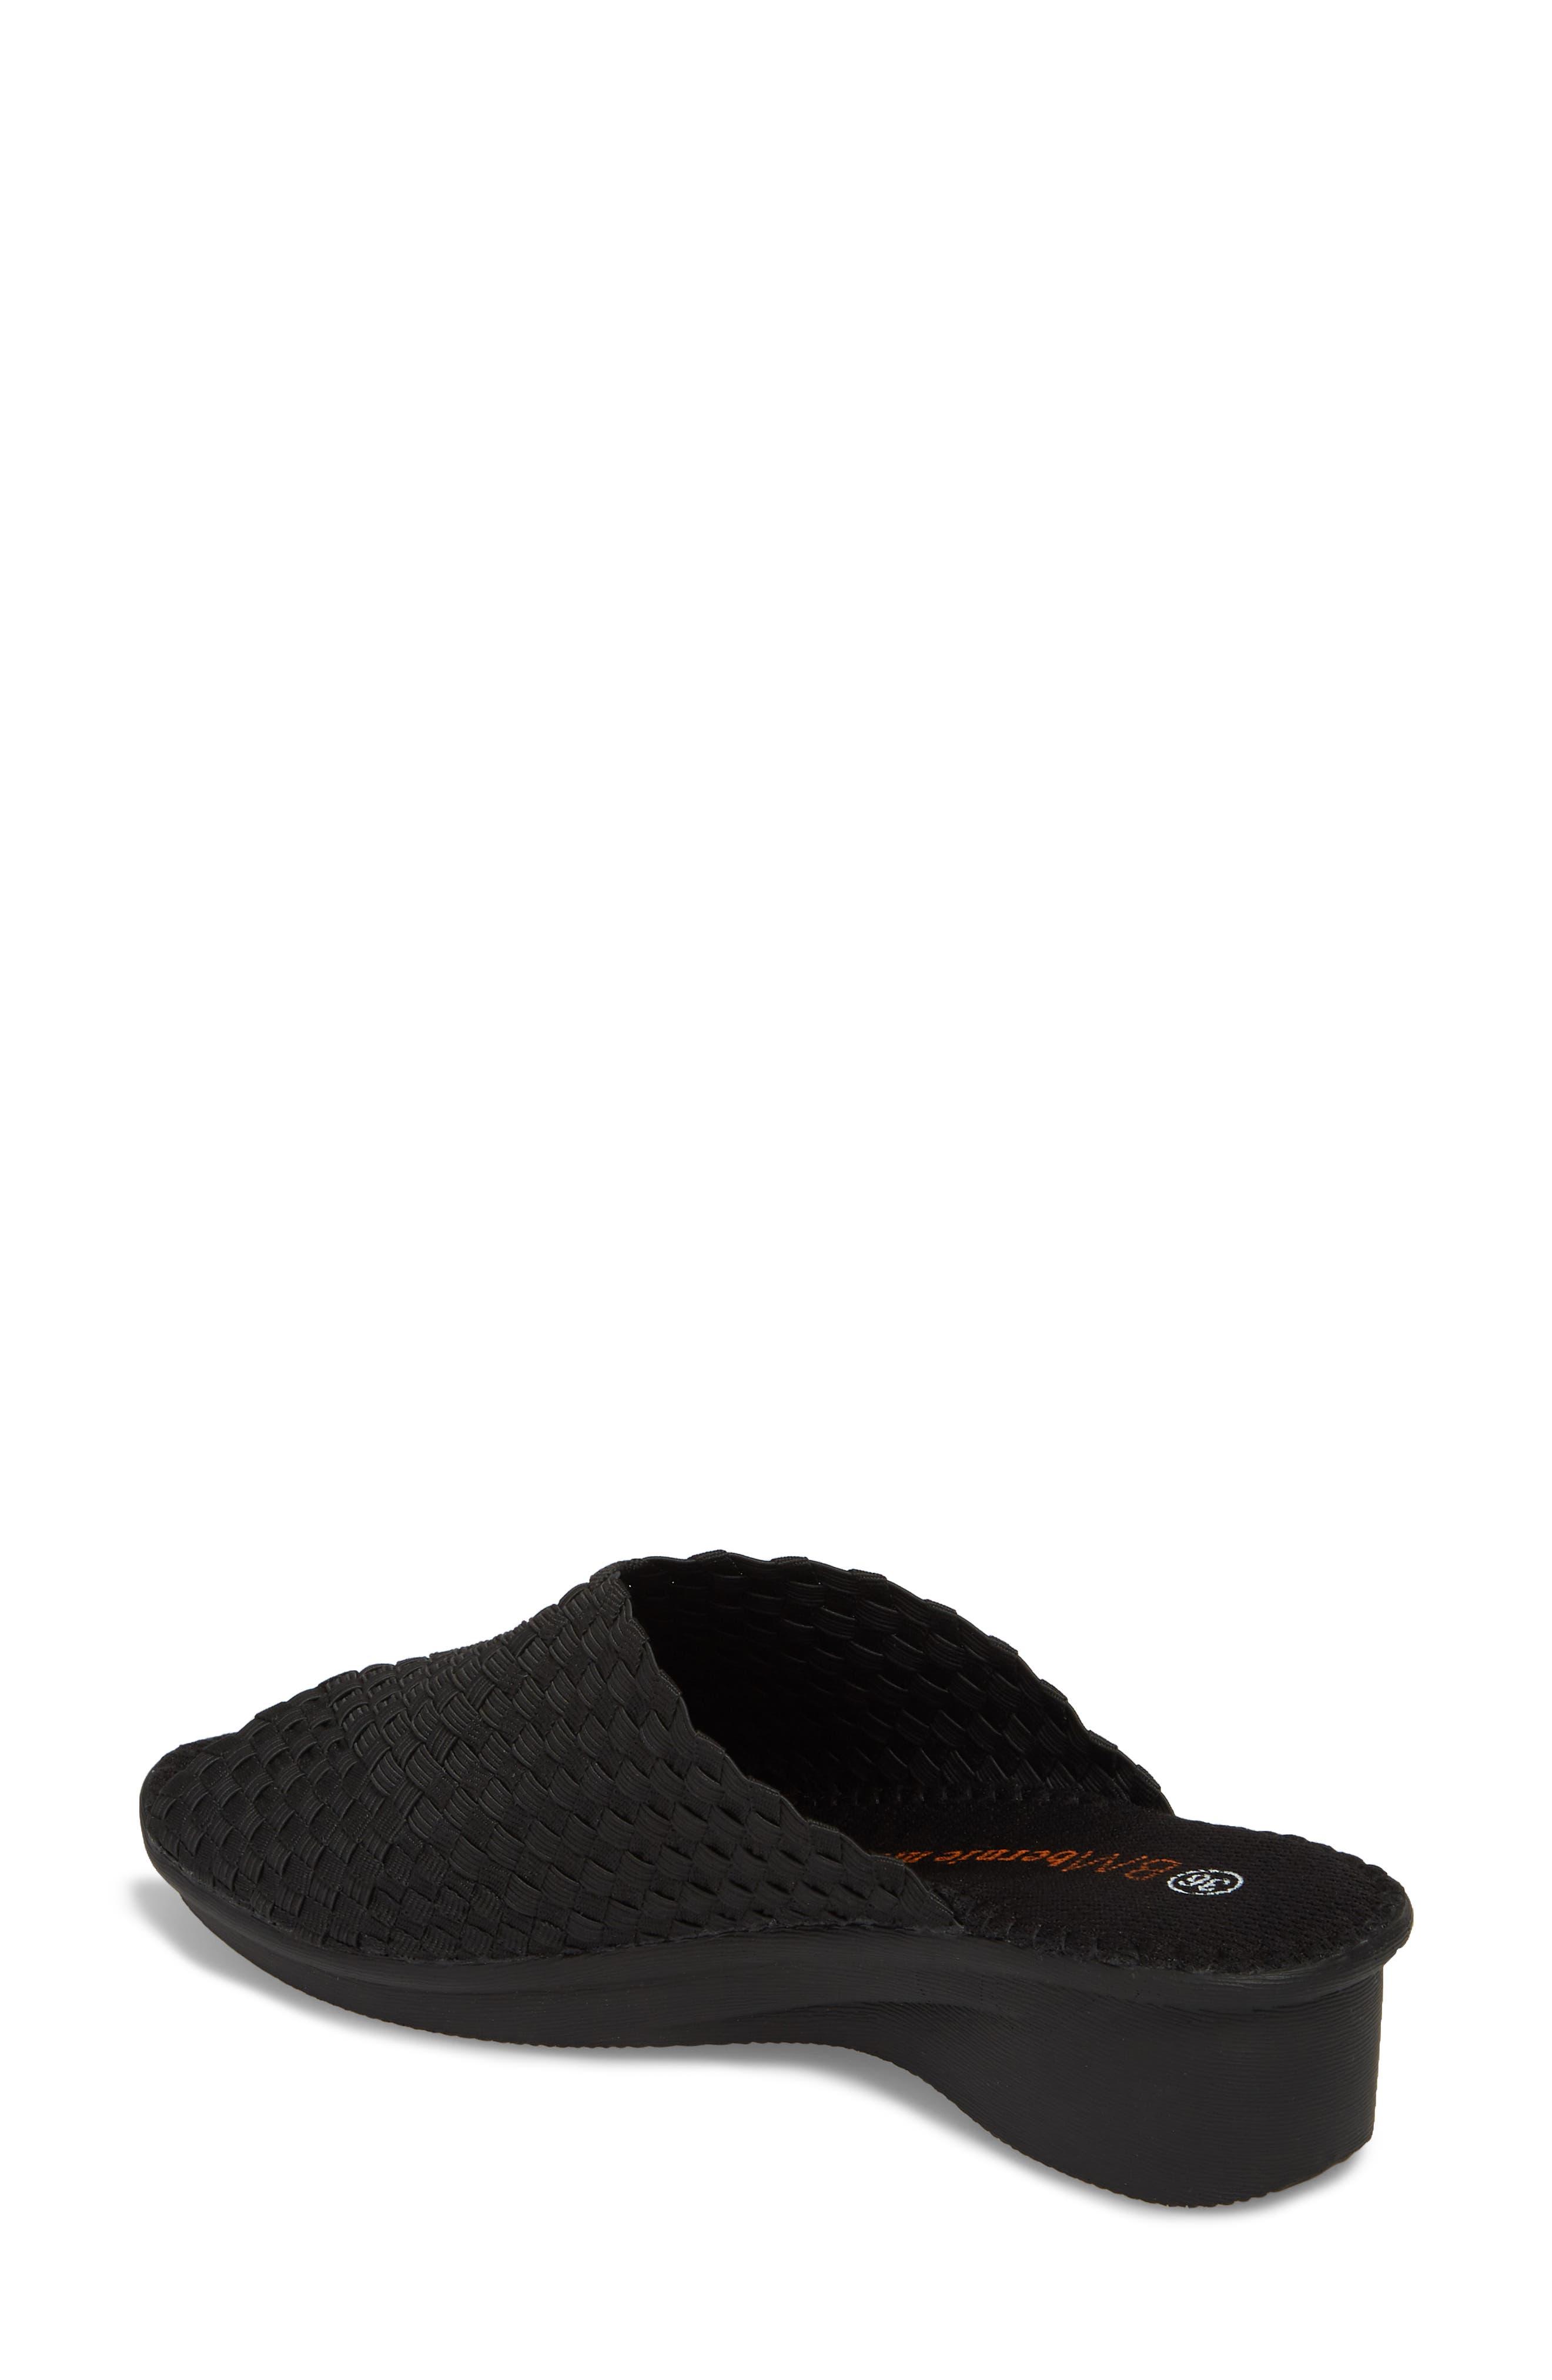 Cyrene Wedge Sandal,                             Alternate thumbnail 2, color,                             BLACK FABRIC